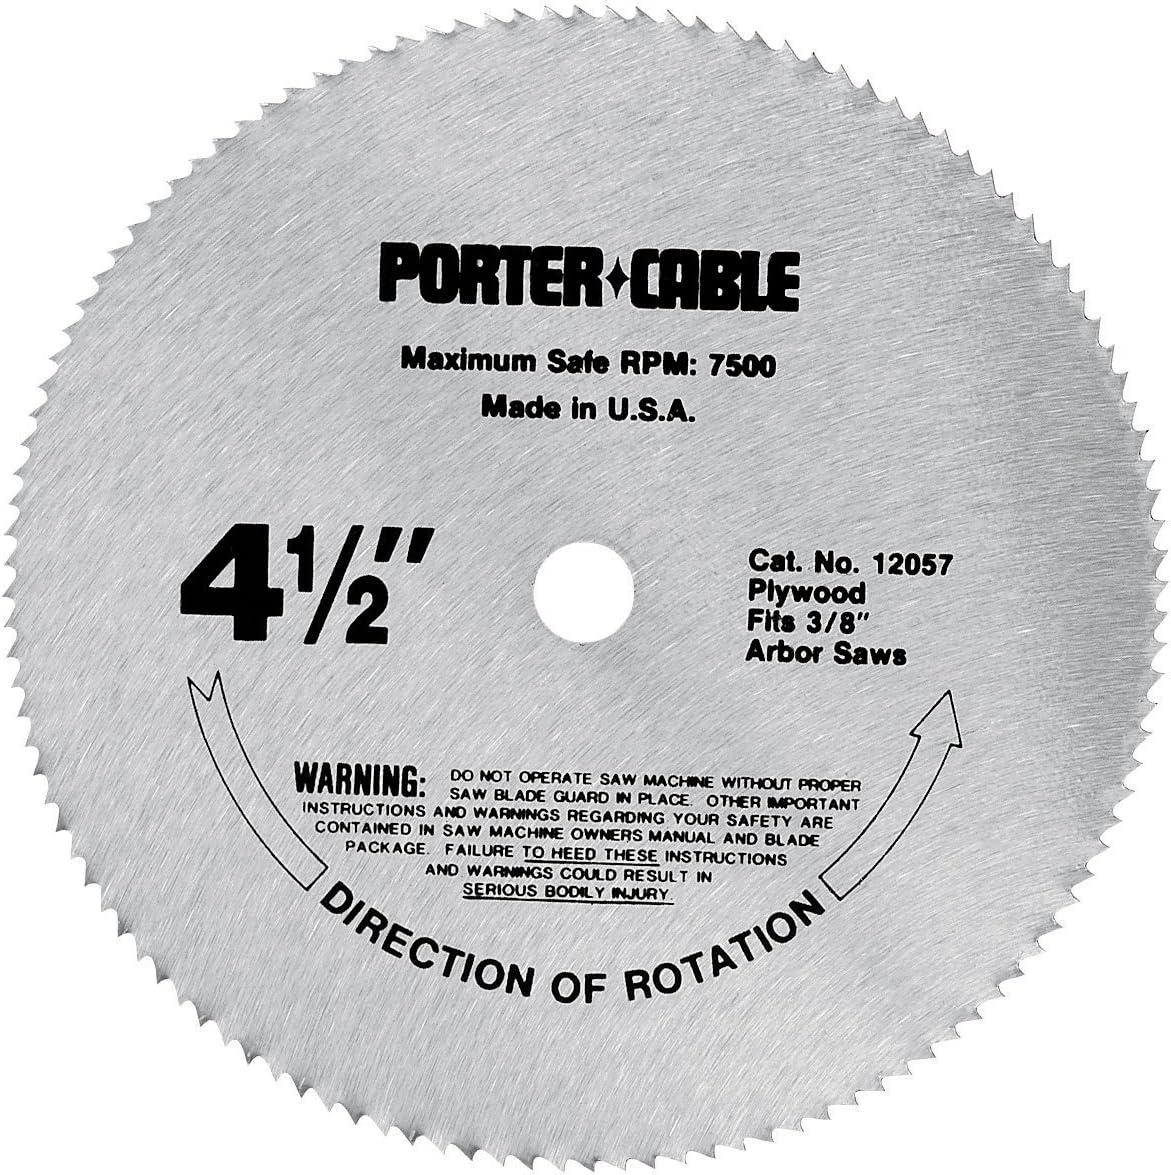 Porter-Cable 4-1/2 Inch Circular Saw Blade